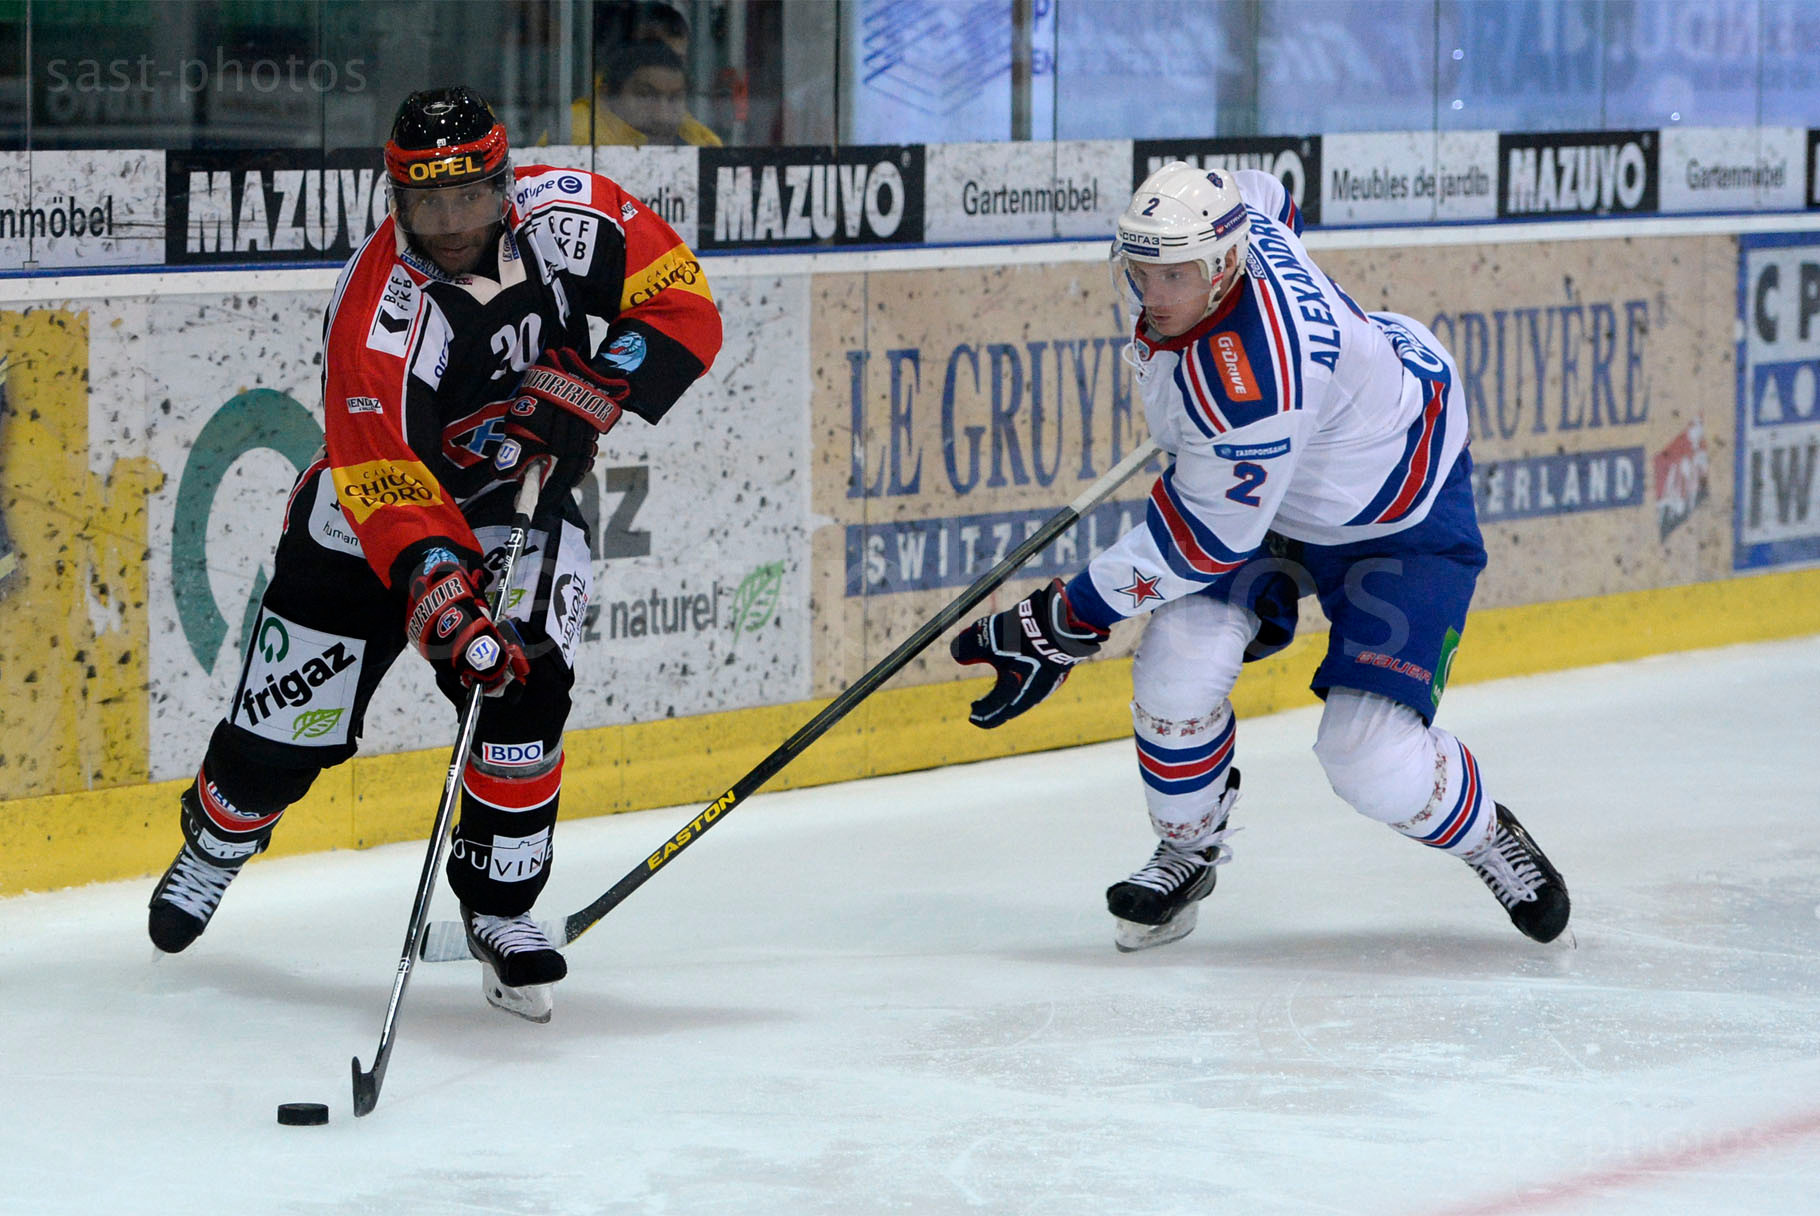 Gregory Mauldin (L. Fribourg) gegen Yury Alexandrov (St. Petersburg)